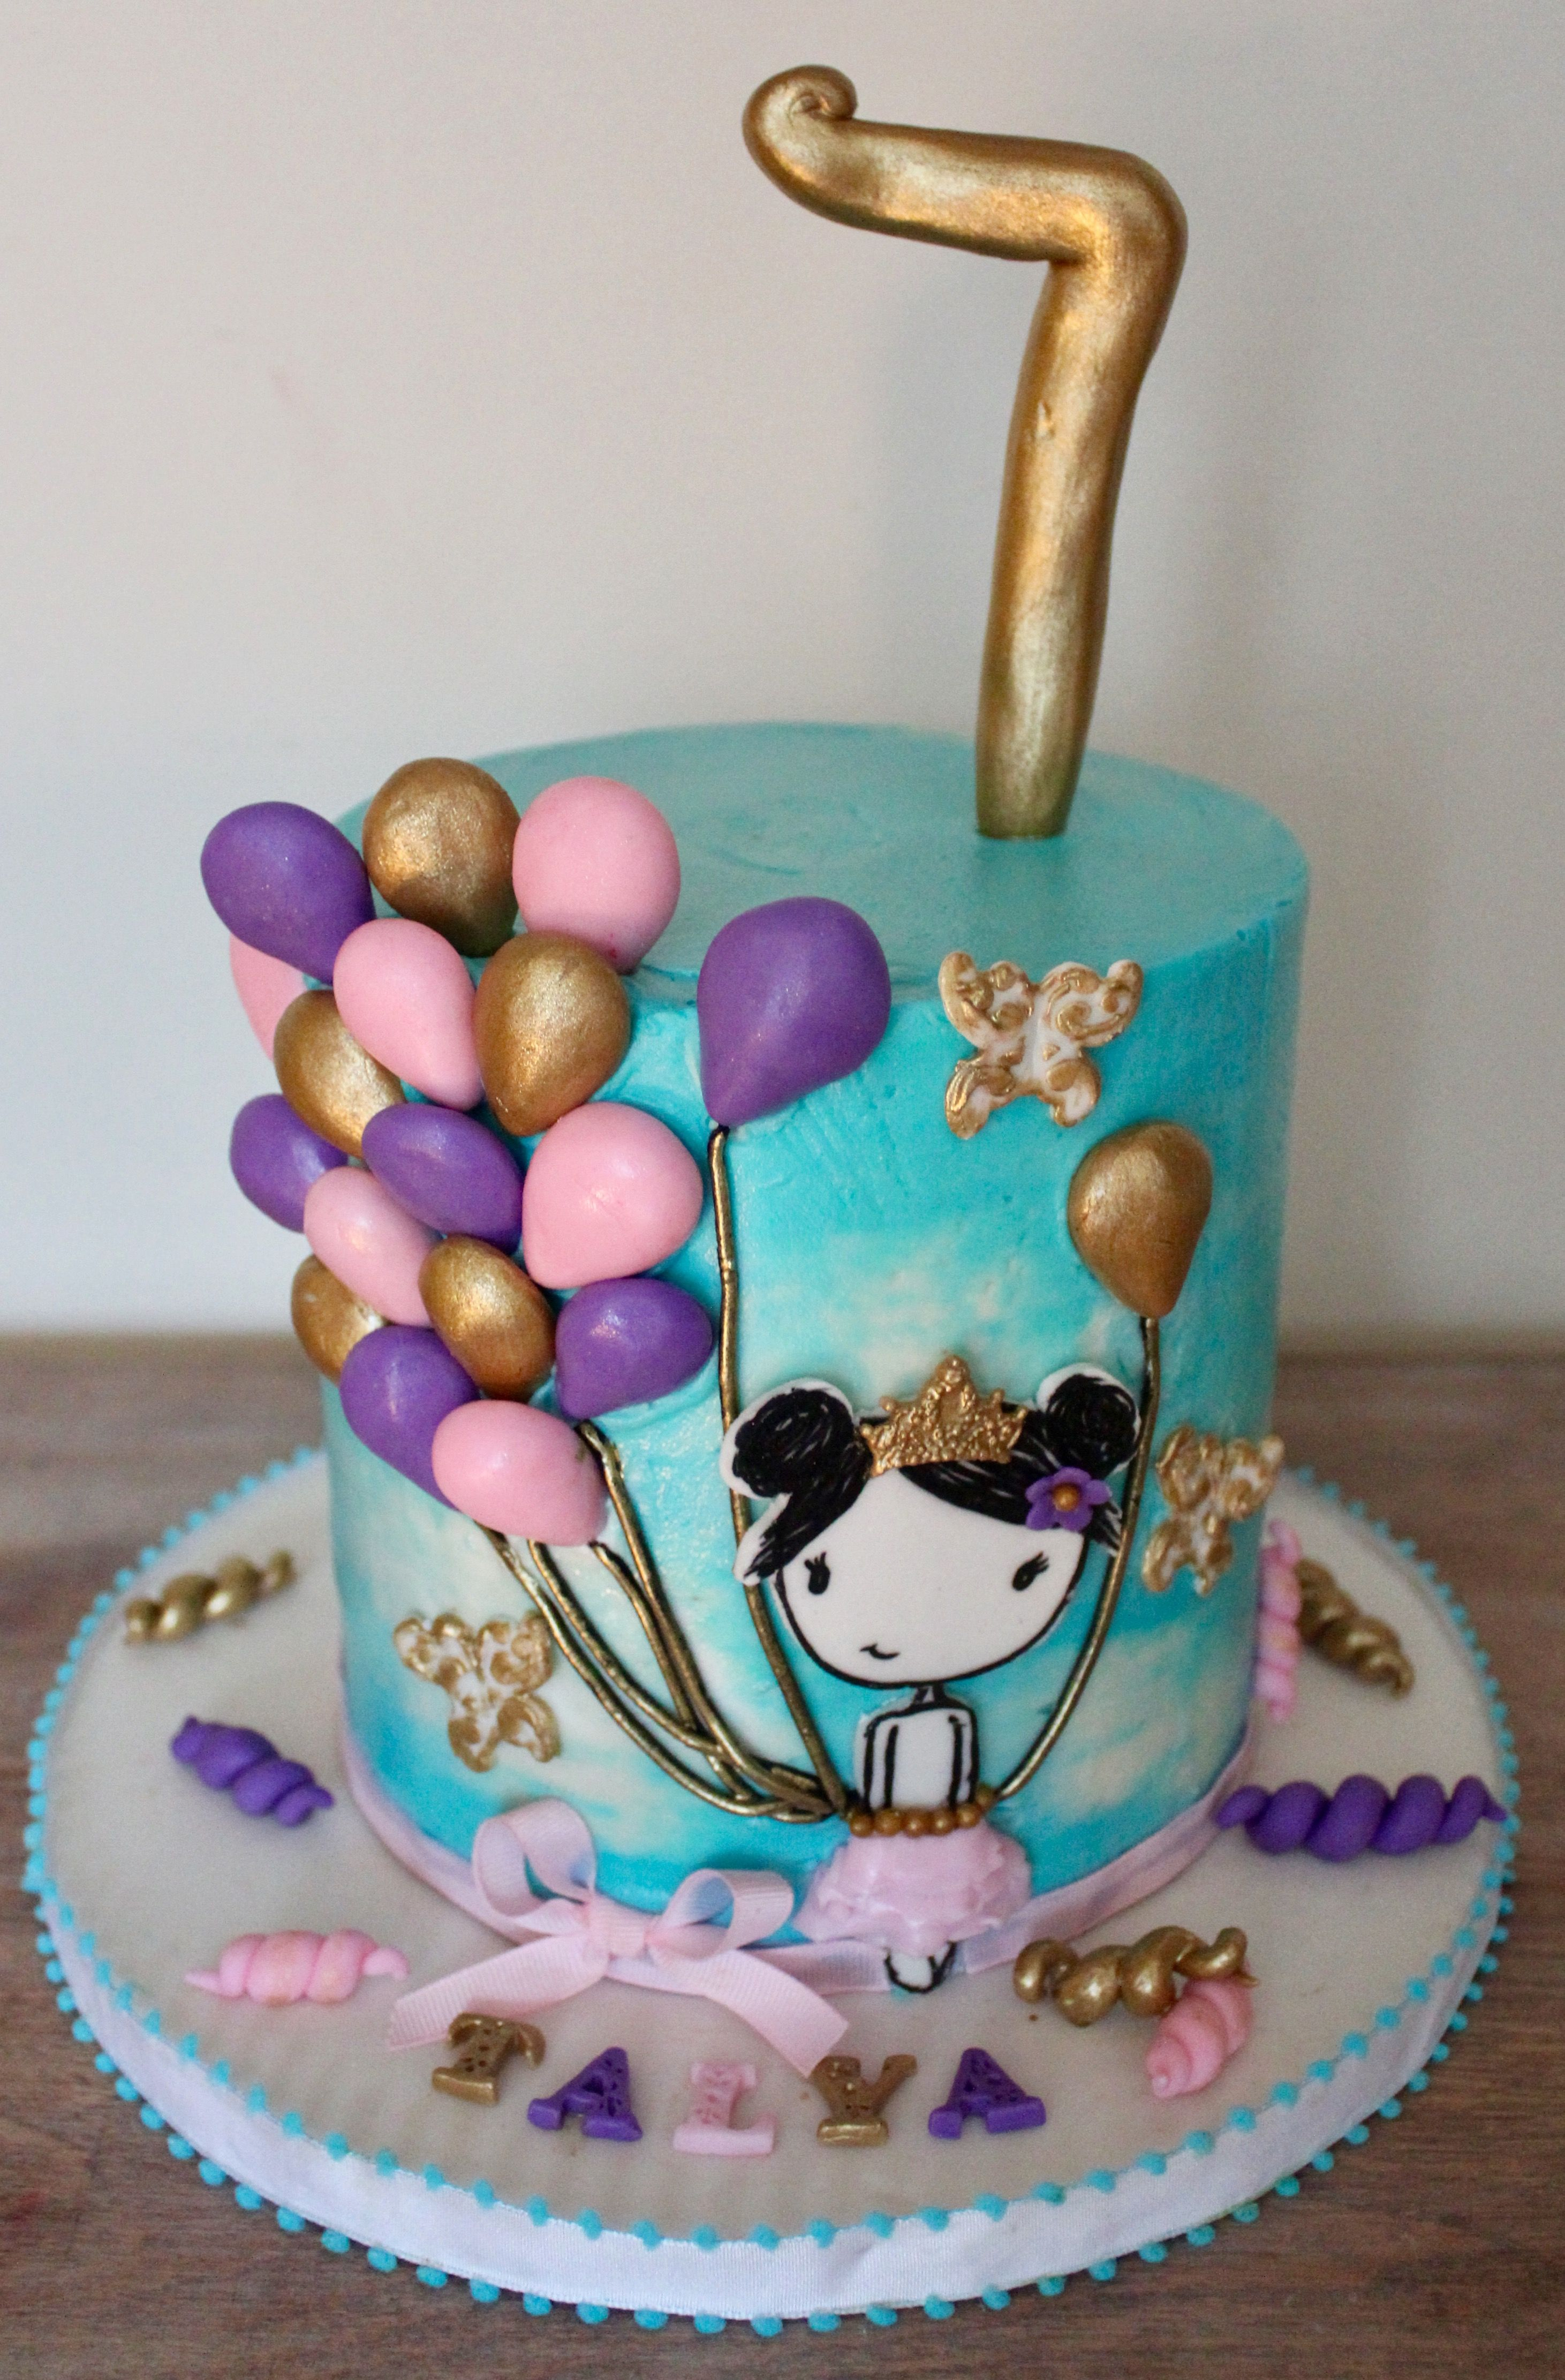 Simple cute balloon and cartoon princess tutu birthday cake with sky